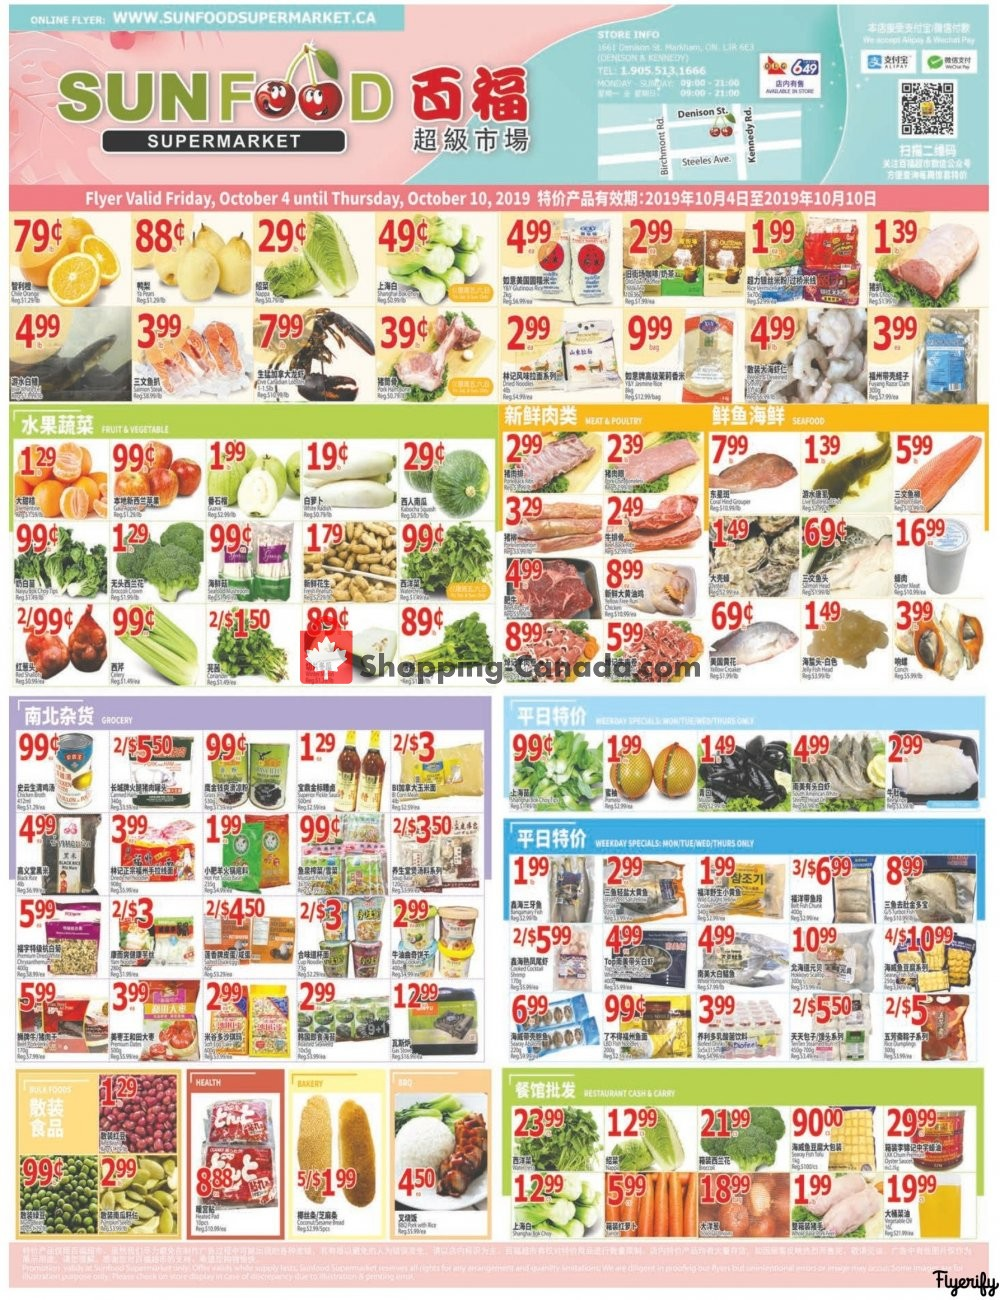 Flyer Sunfood Supermarket Canada - from Friday October 4, 2019 to Thursday October 10, 2019